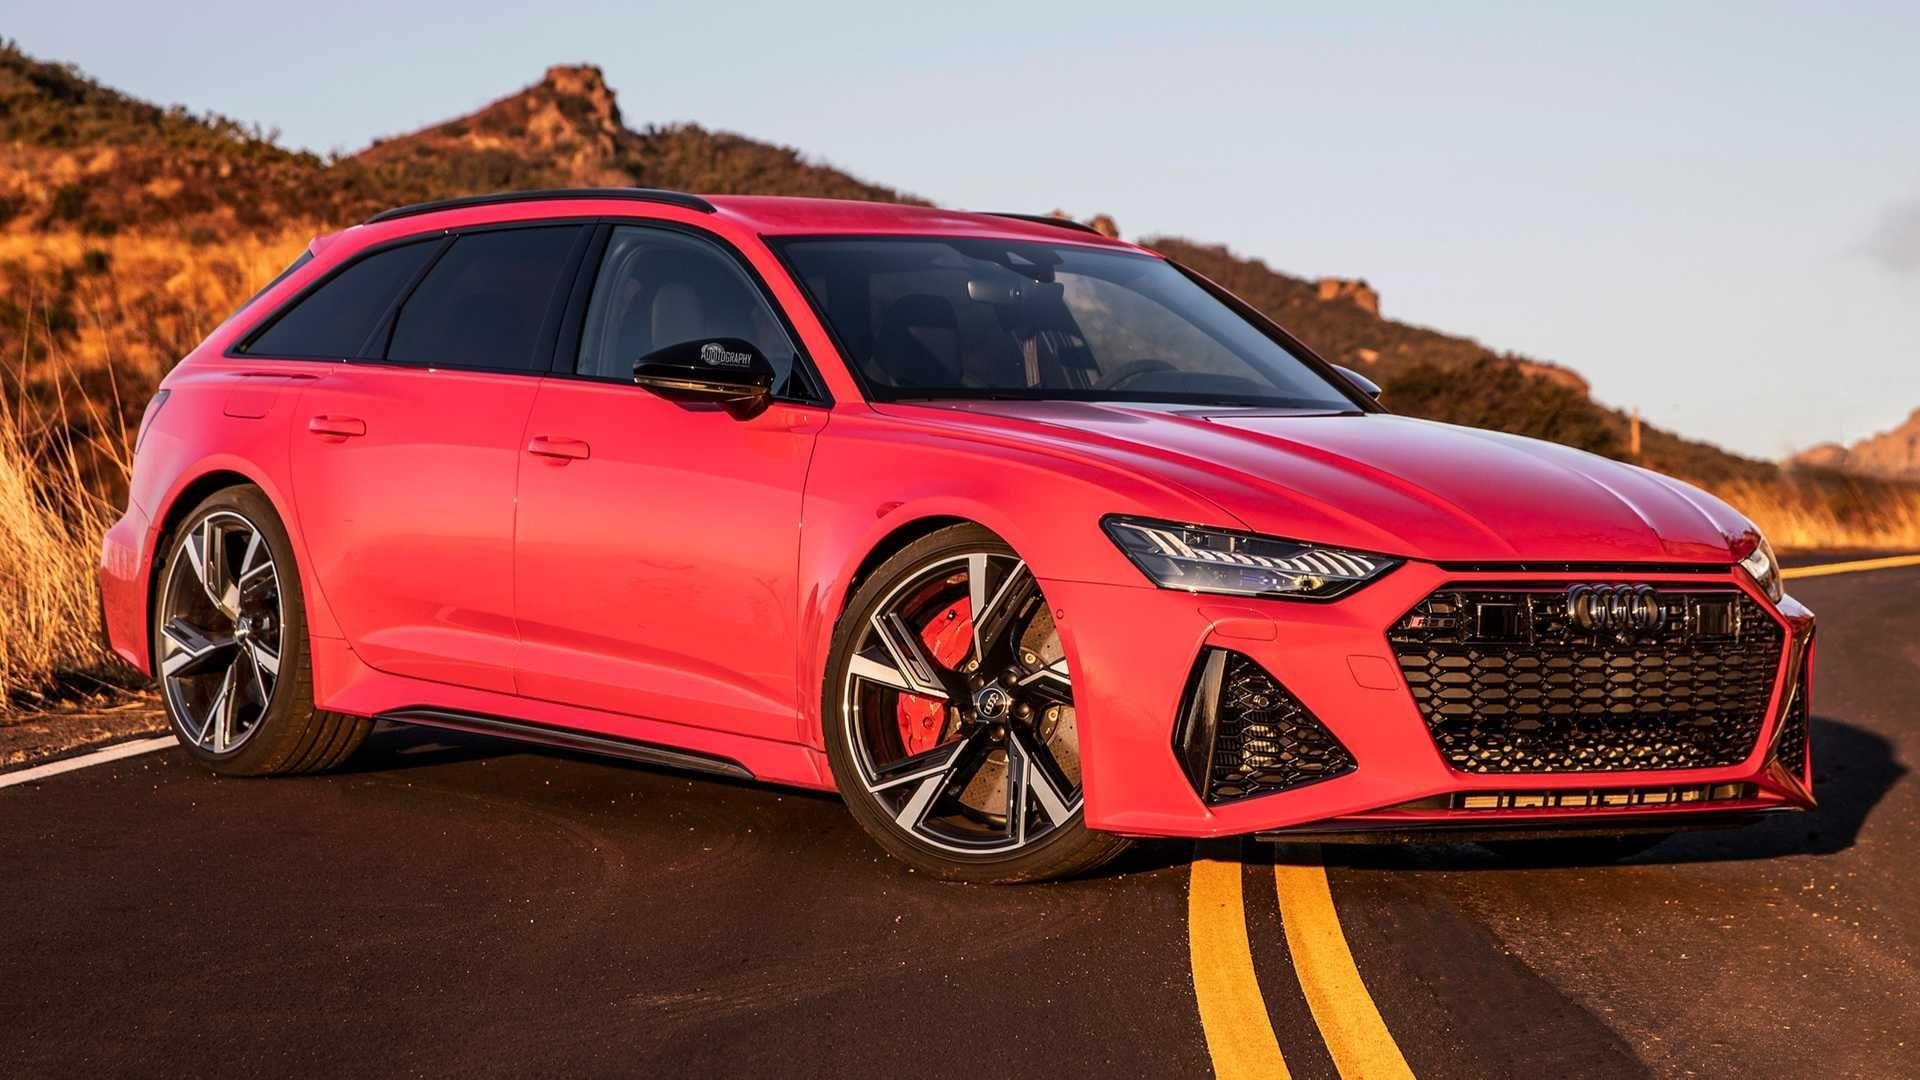 2021 Audi A6 Wagon Launch In 2020 Audi Rs6 Audi Audi Rs6 Wagon